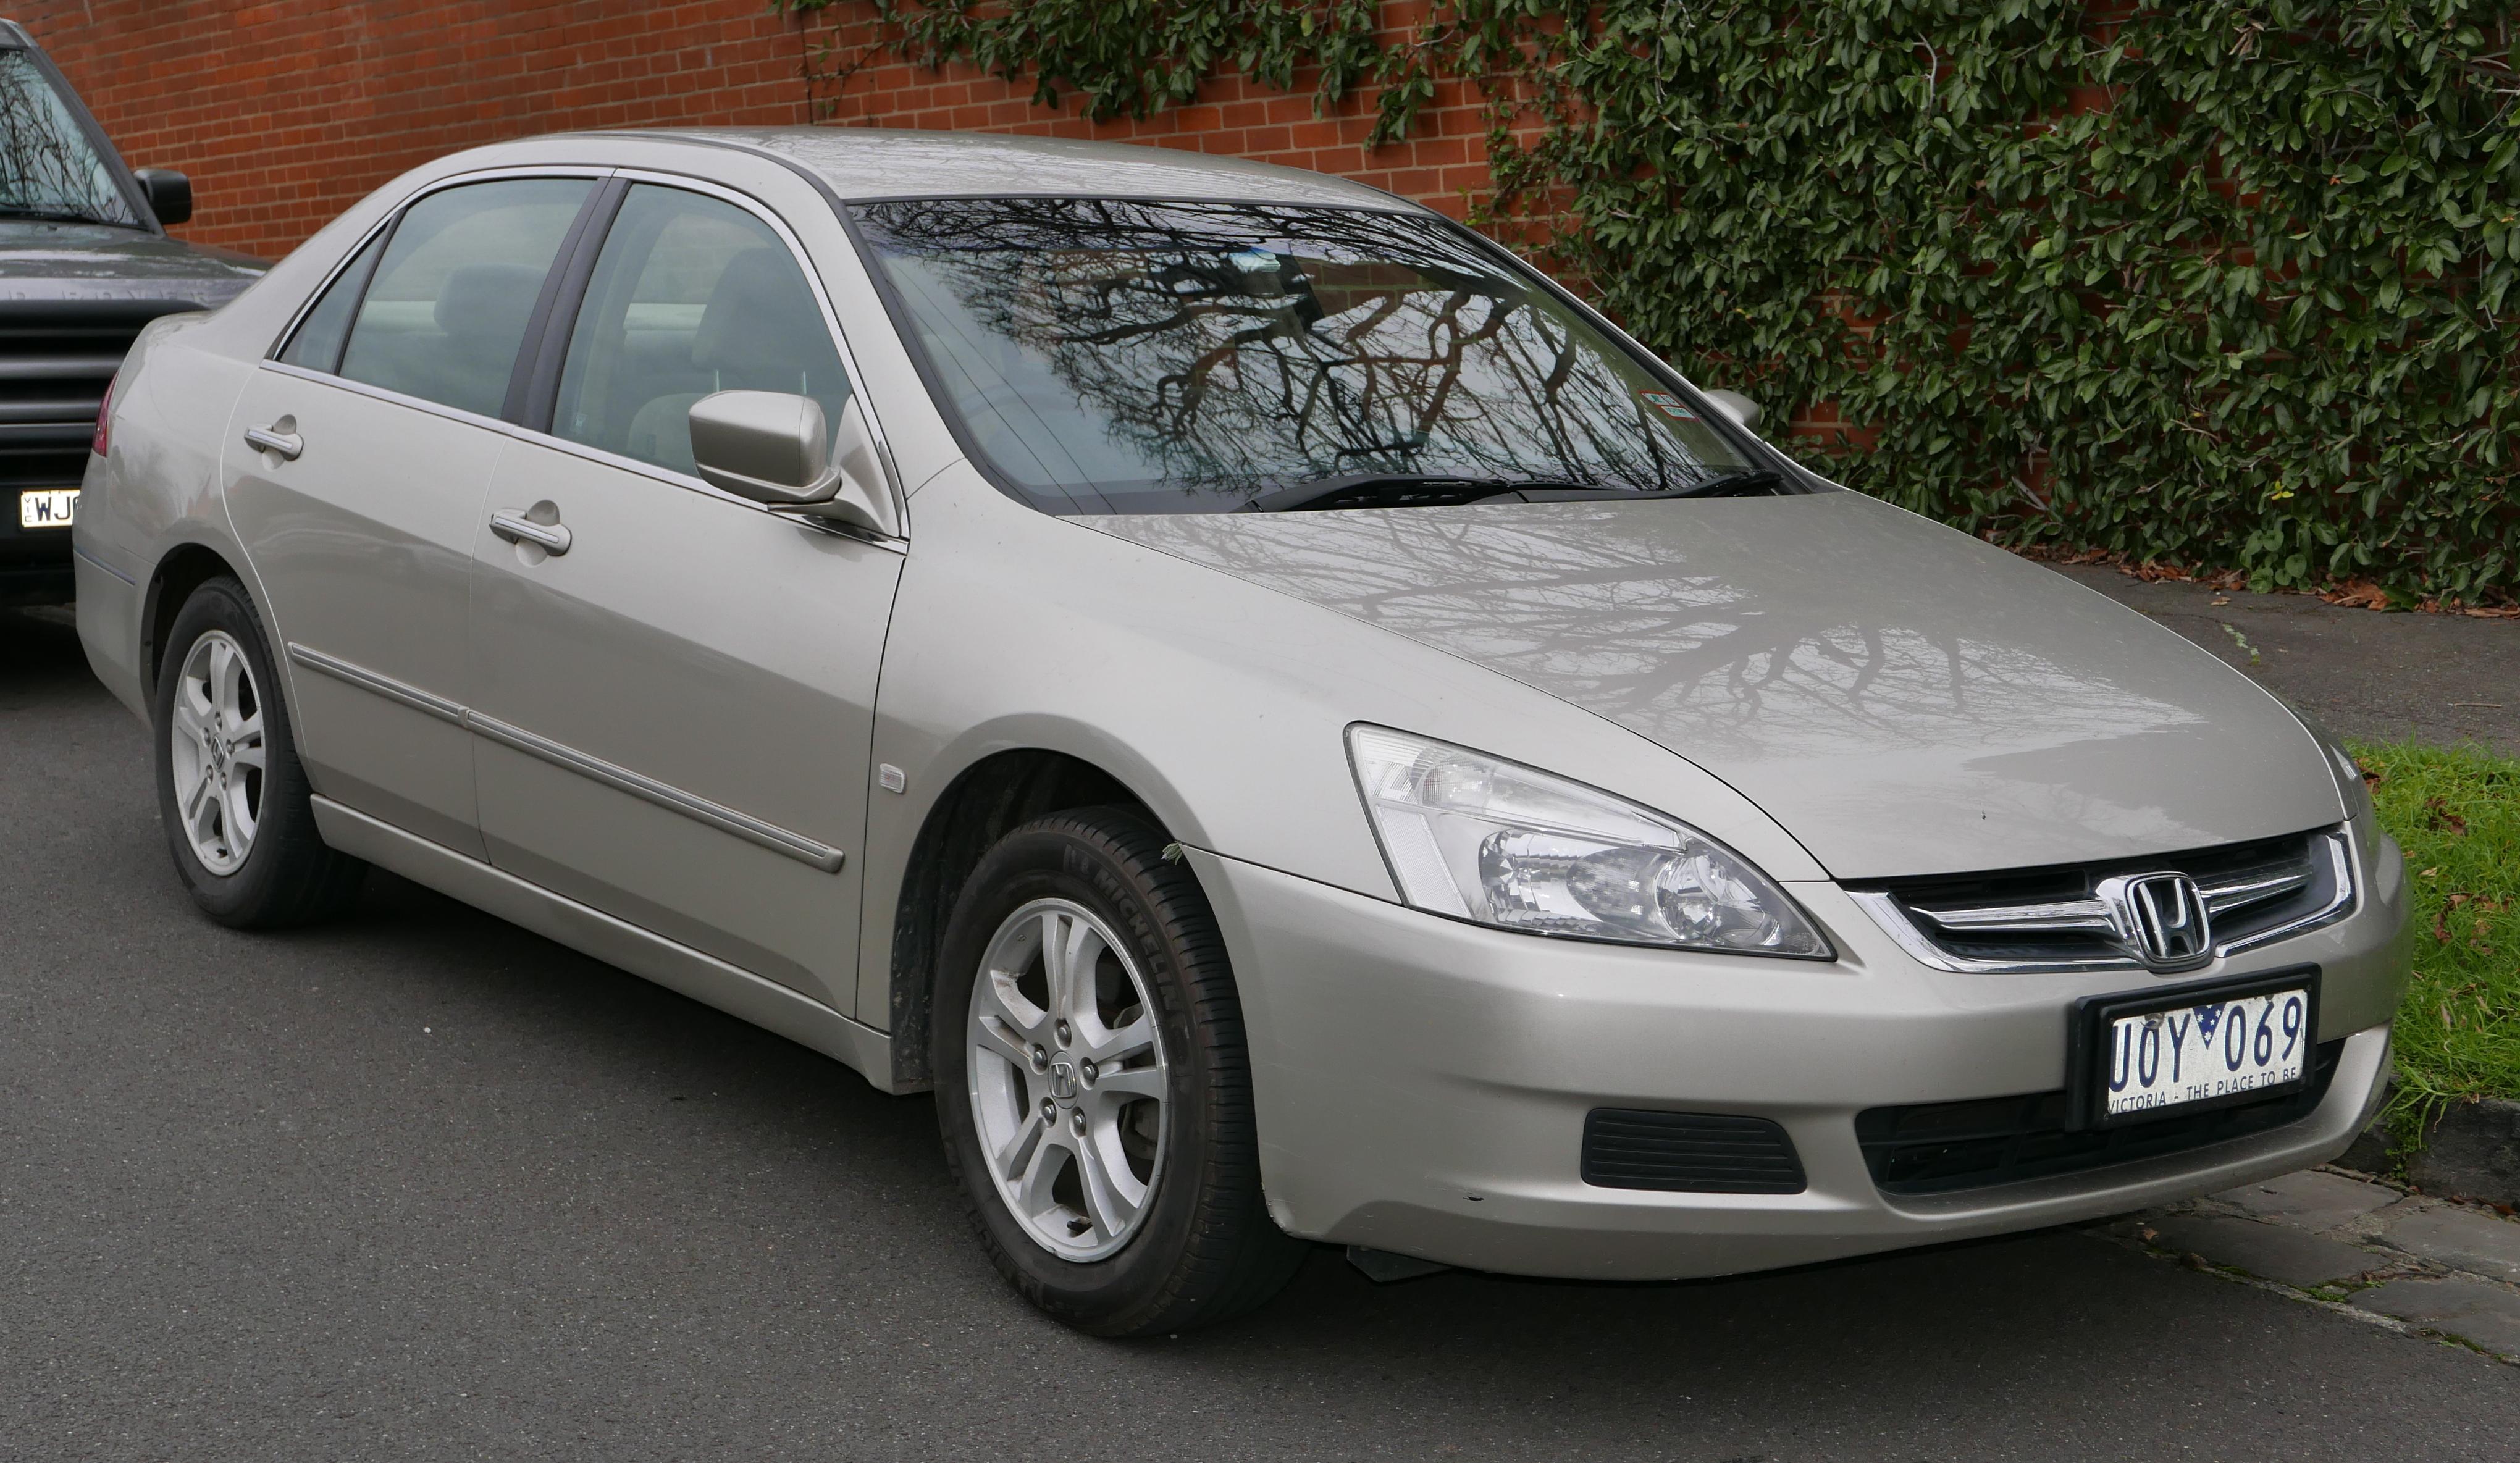 Ficheiro:2006 Honda Accord (MY07) VTi Sedan (2015 07 09